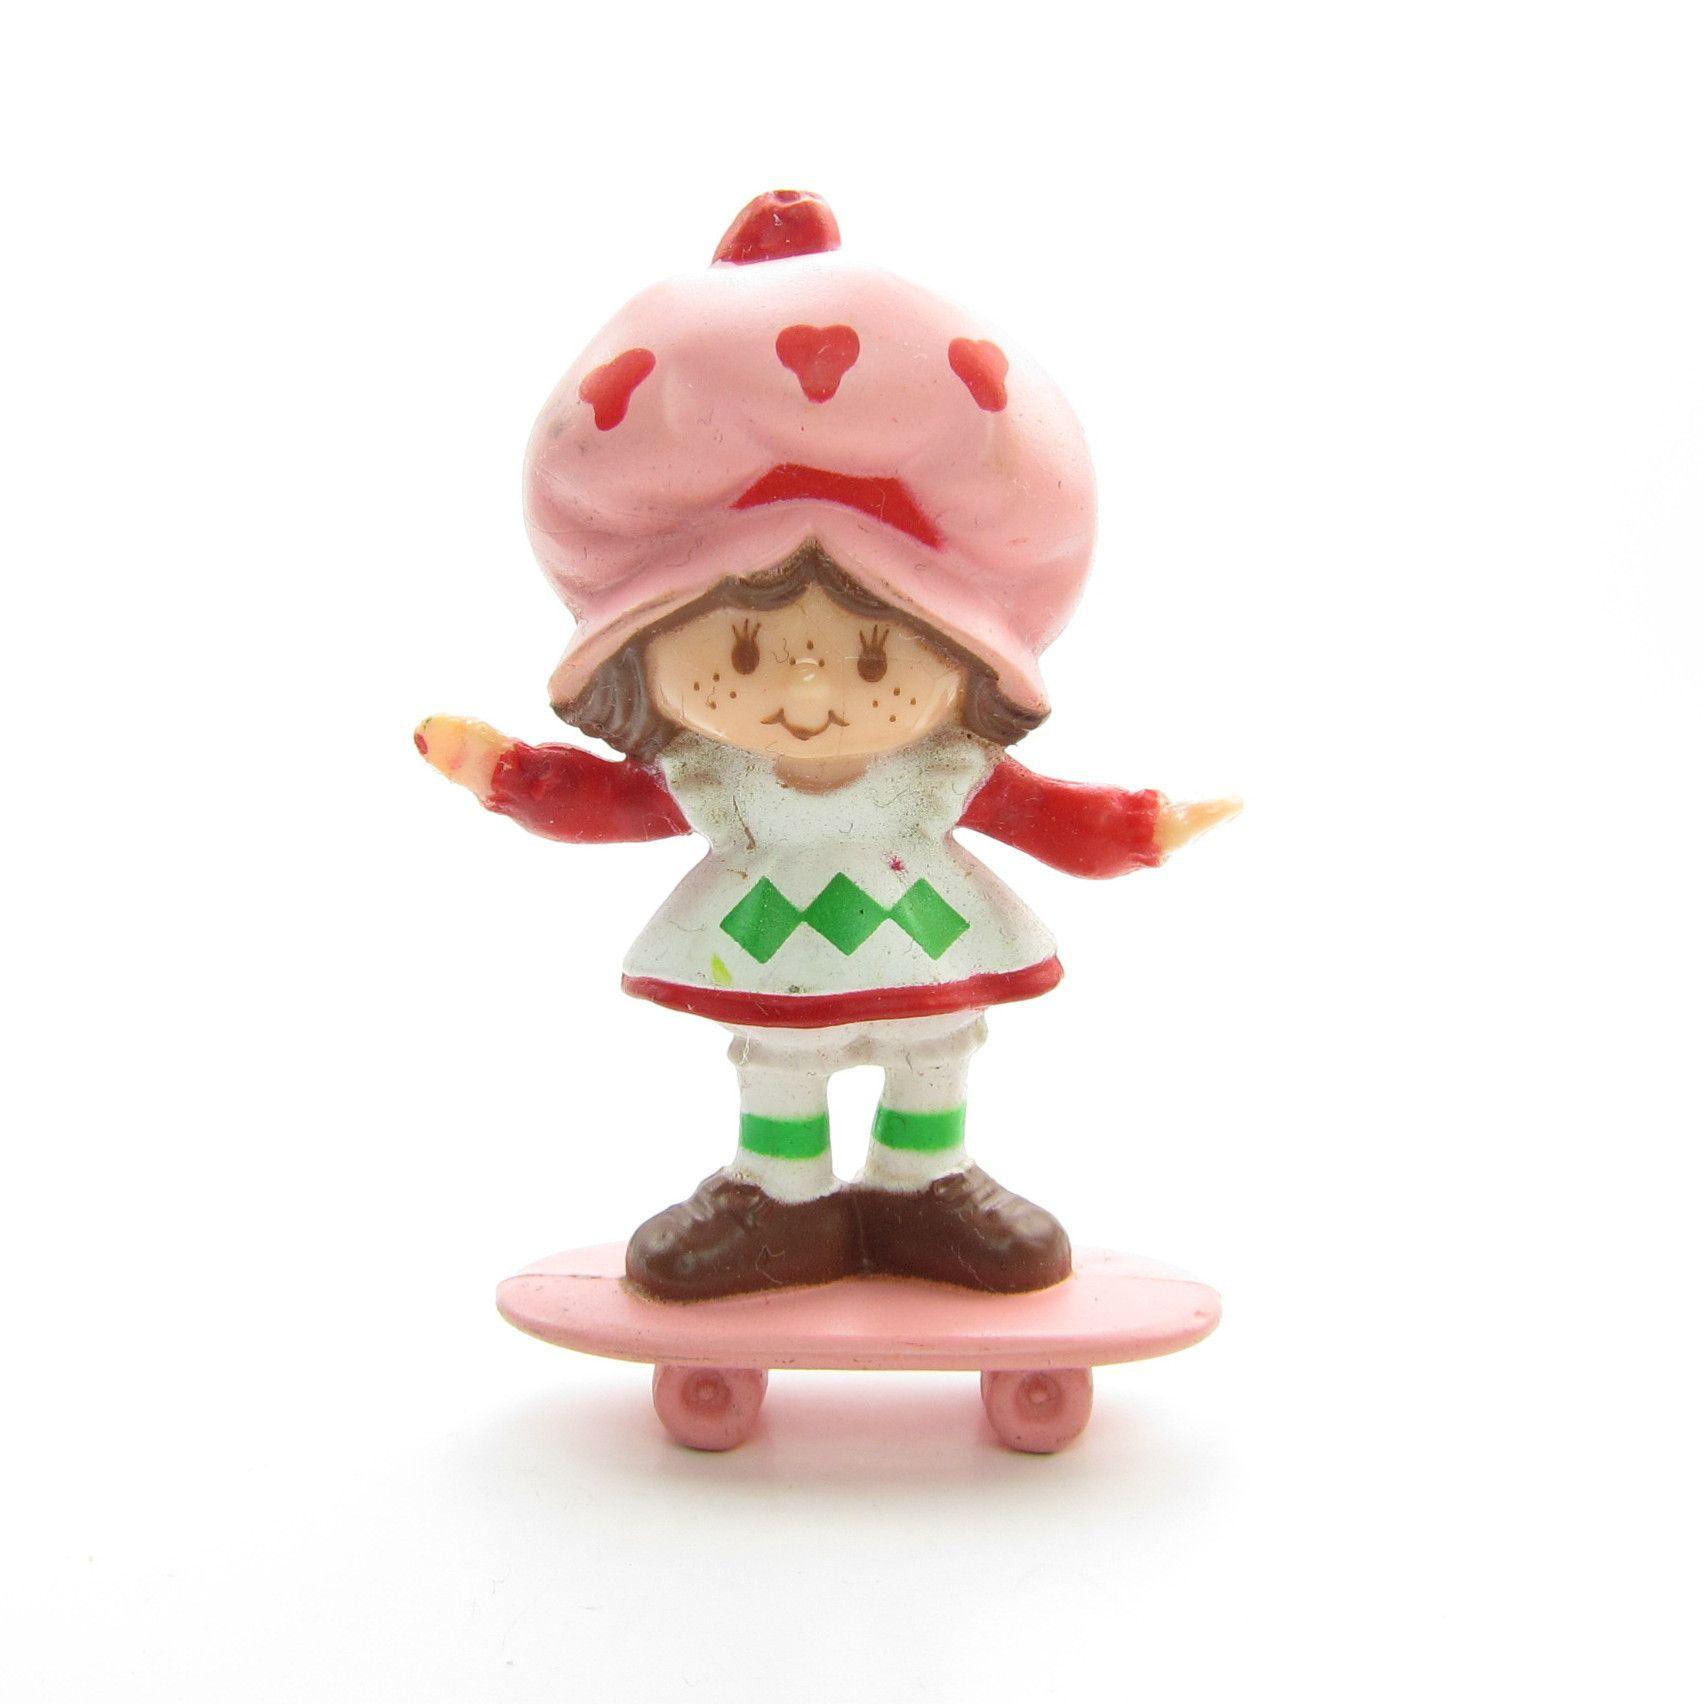 Strawberry Shortcake on a Skateboard NEW Vintage Strawberry Shortcake Miniature